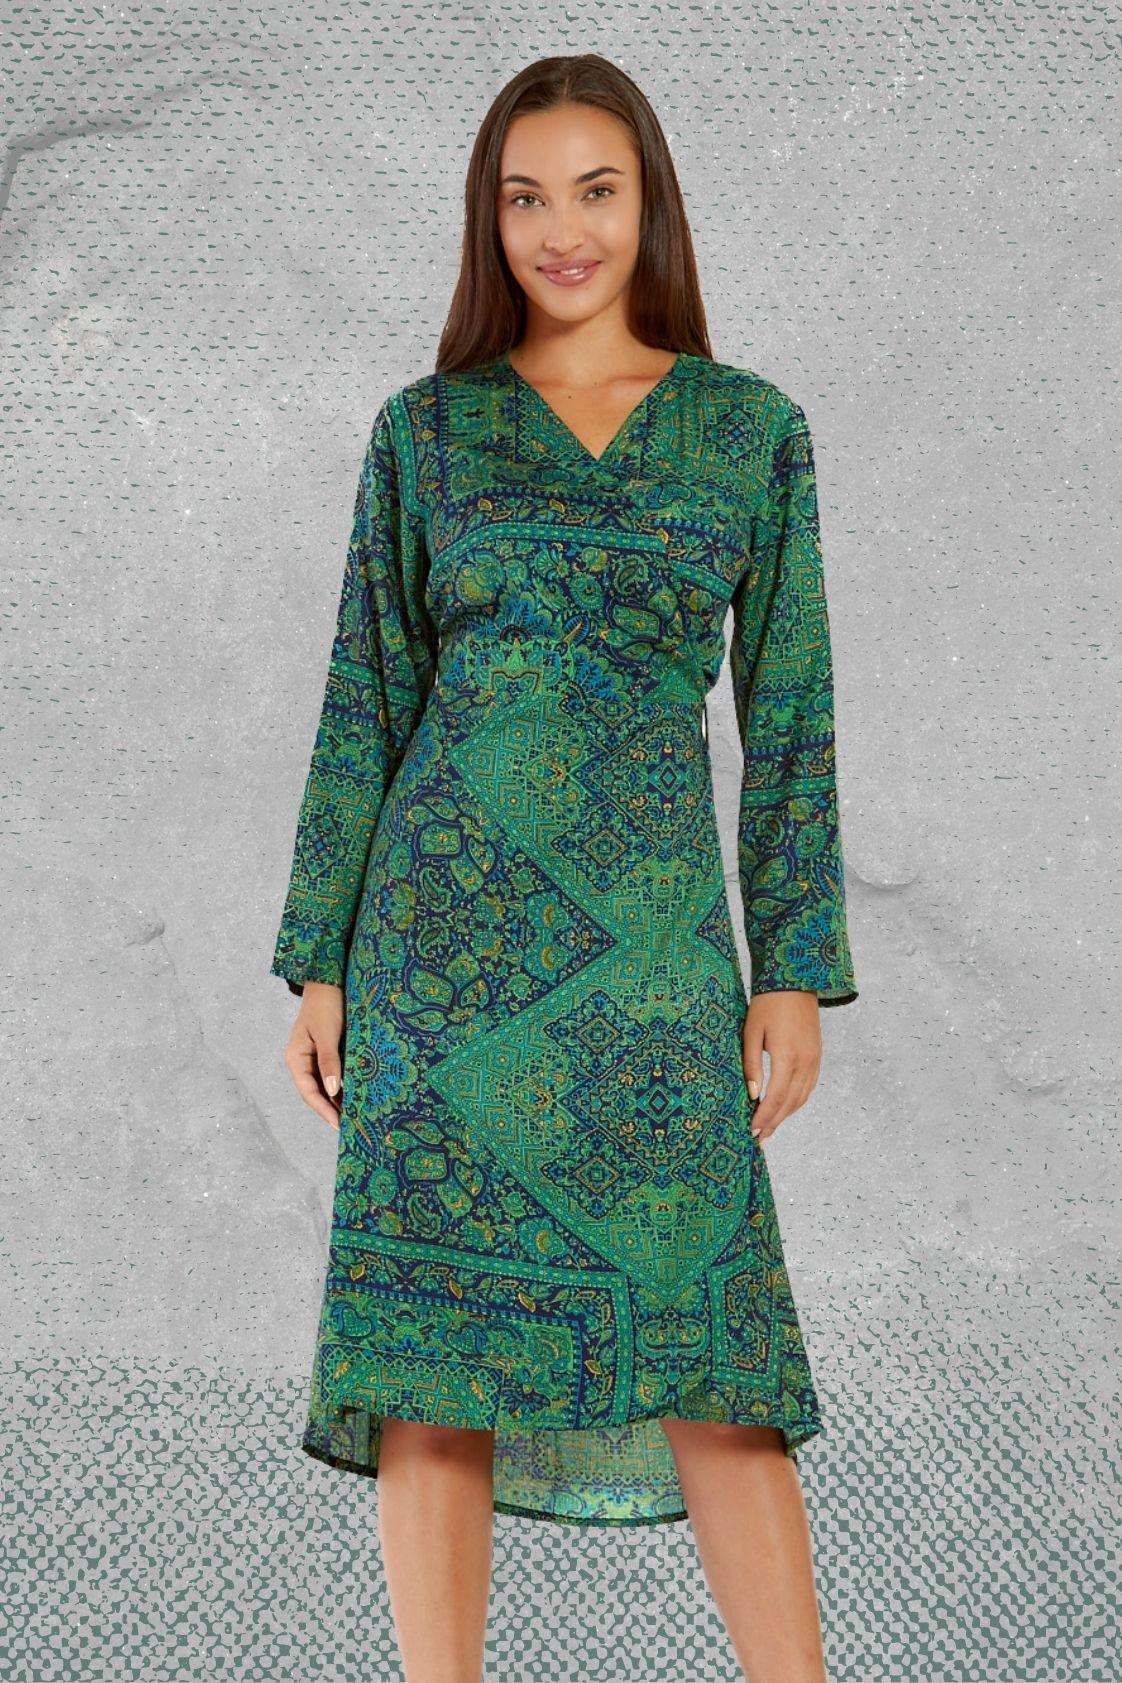 Micki long Sleeve Wrap Dress - Jewel Print